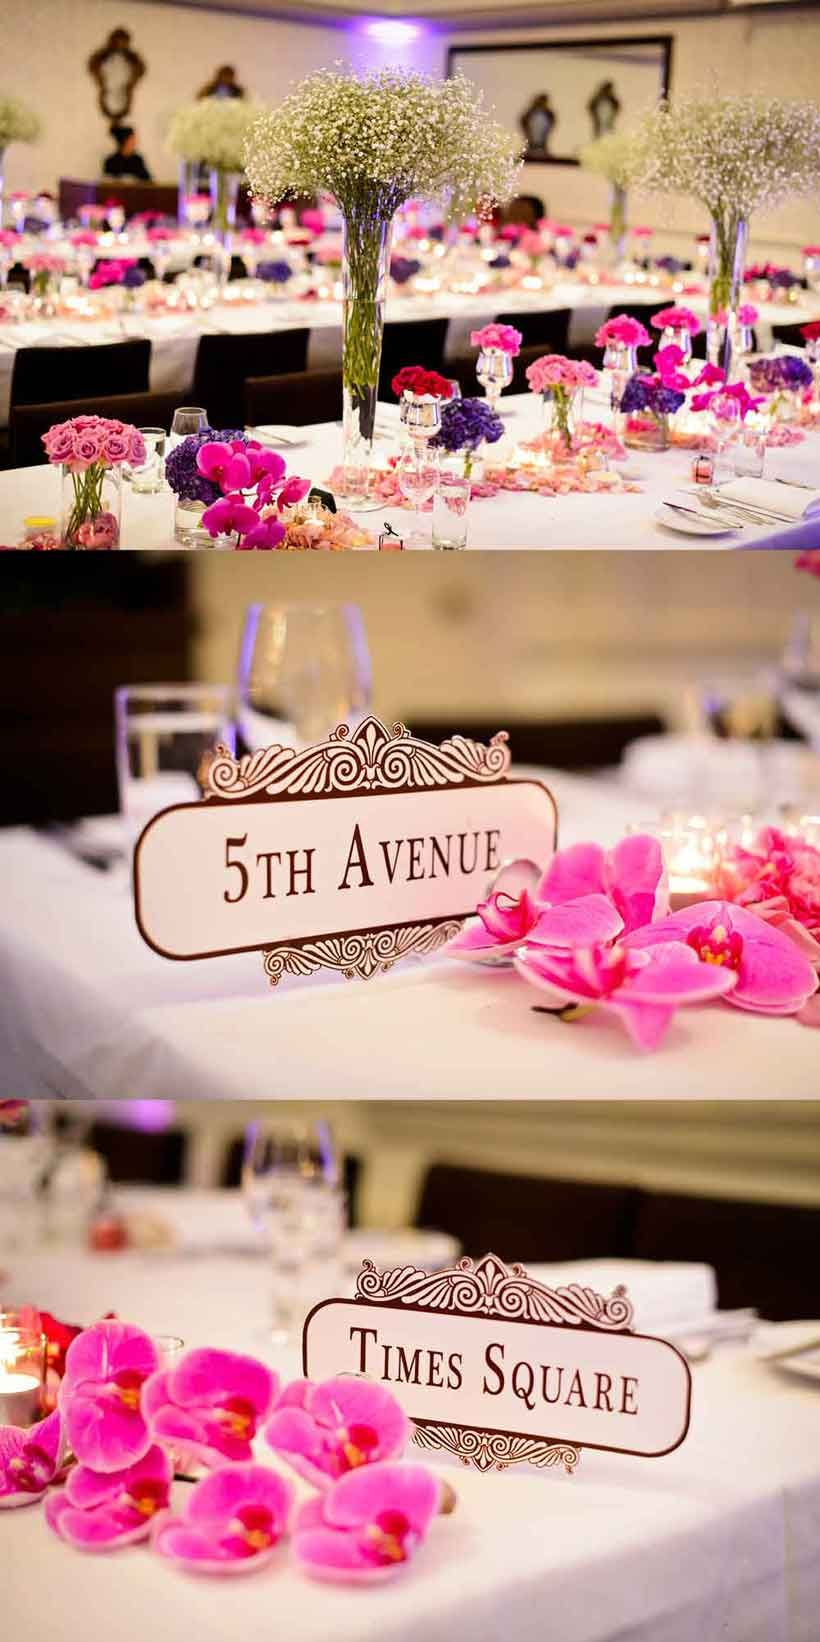 Creative Table Numbers | Wedding | Pinterest | Table numbers ...